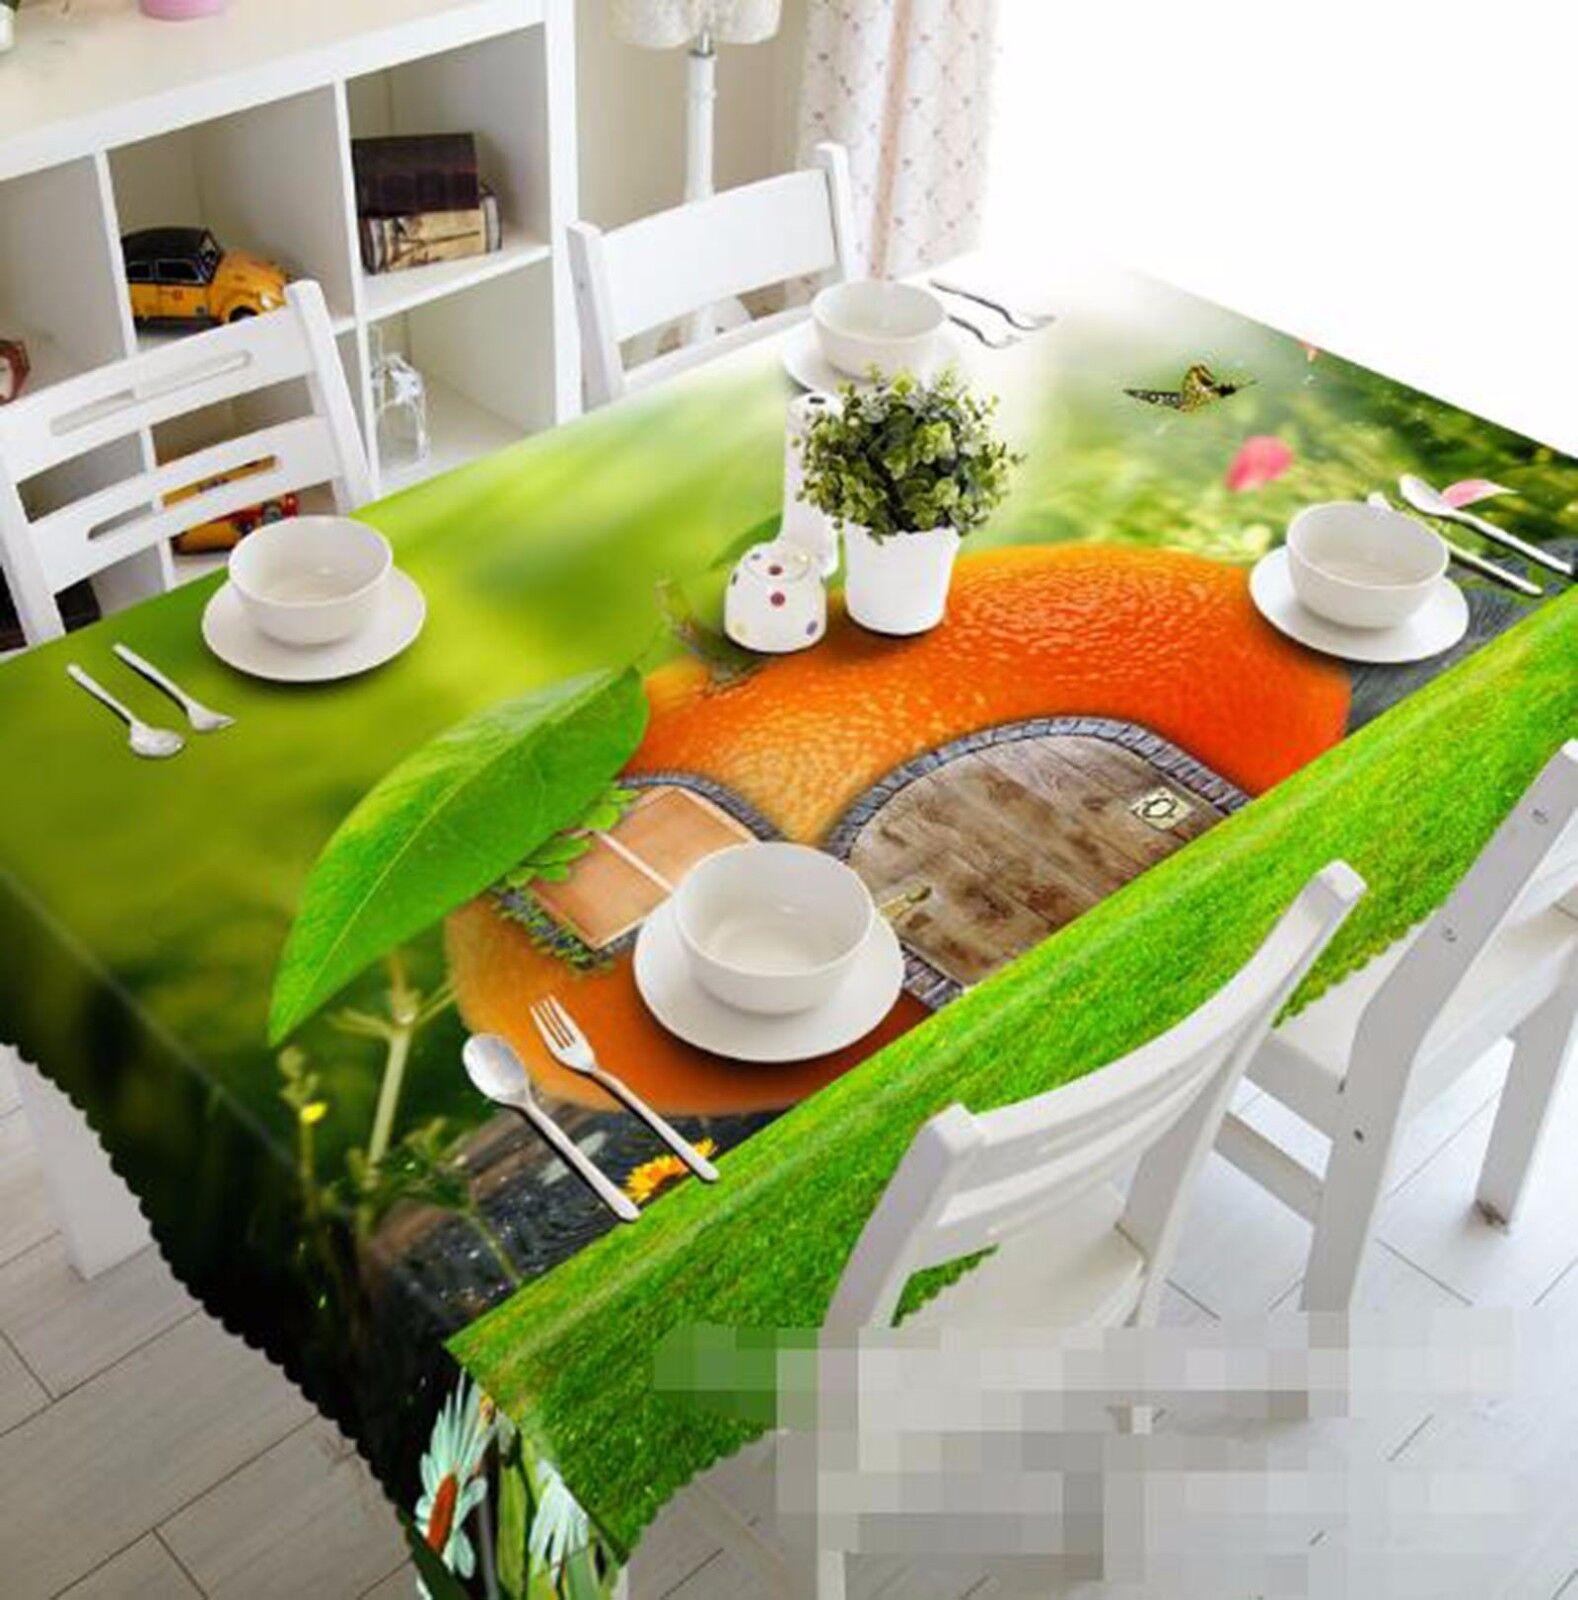 3D orange 63 Tablecloth Table Cover Cloth Birthday Party AJ WALLPAPER UK Lemon